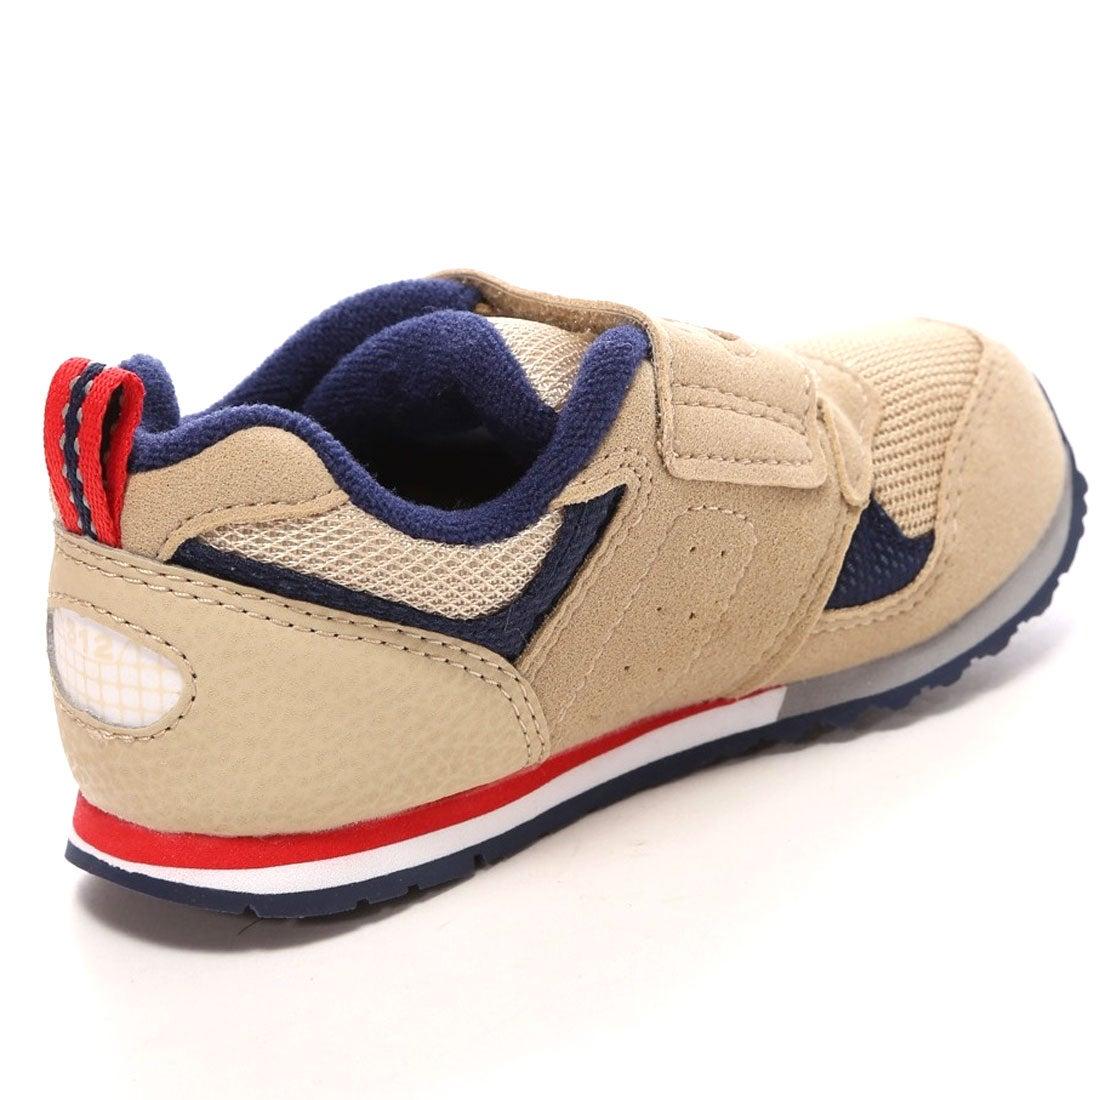 8a1e544bfa8b3 ニューバランス new balance NB FS312 BEI(ベージュ) -靴 ...